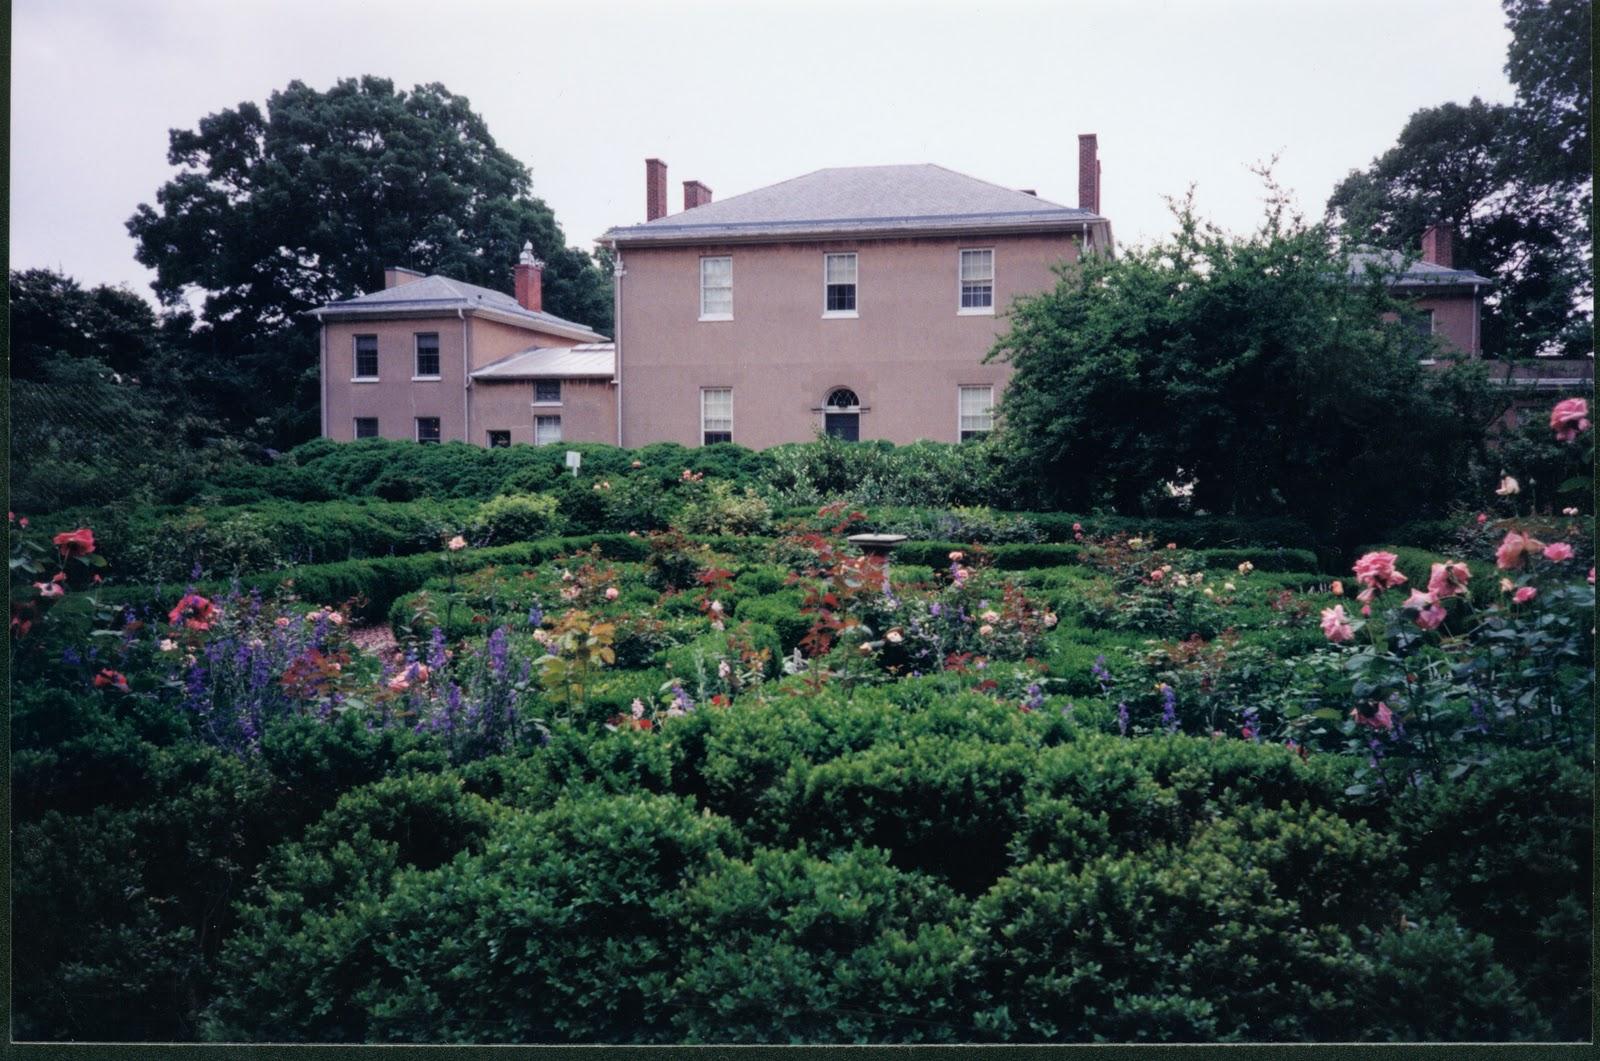 Shovel Ready Knot Garden Restoration Underway Tudor Place Historic House And Garden